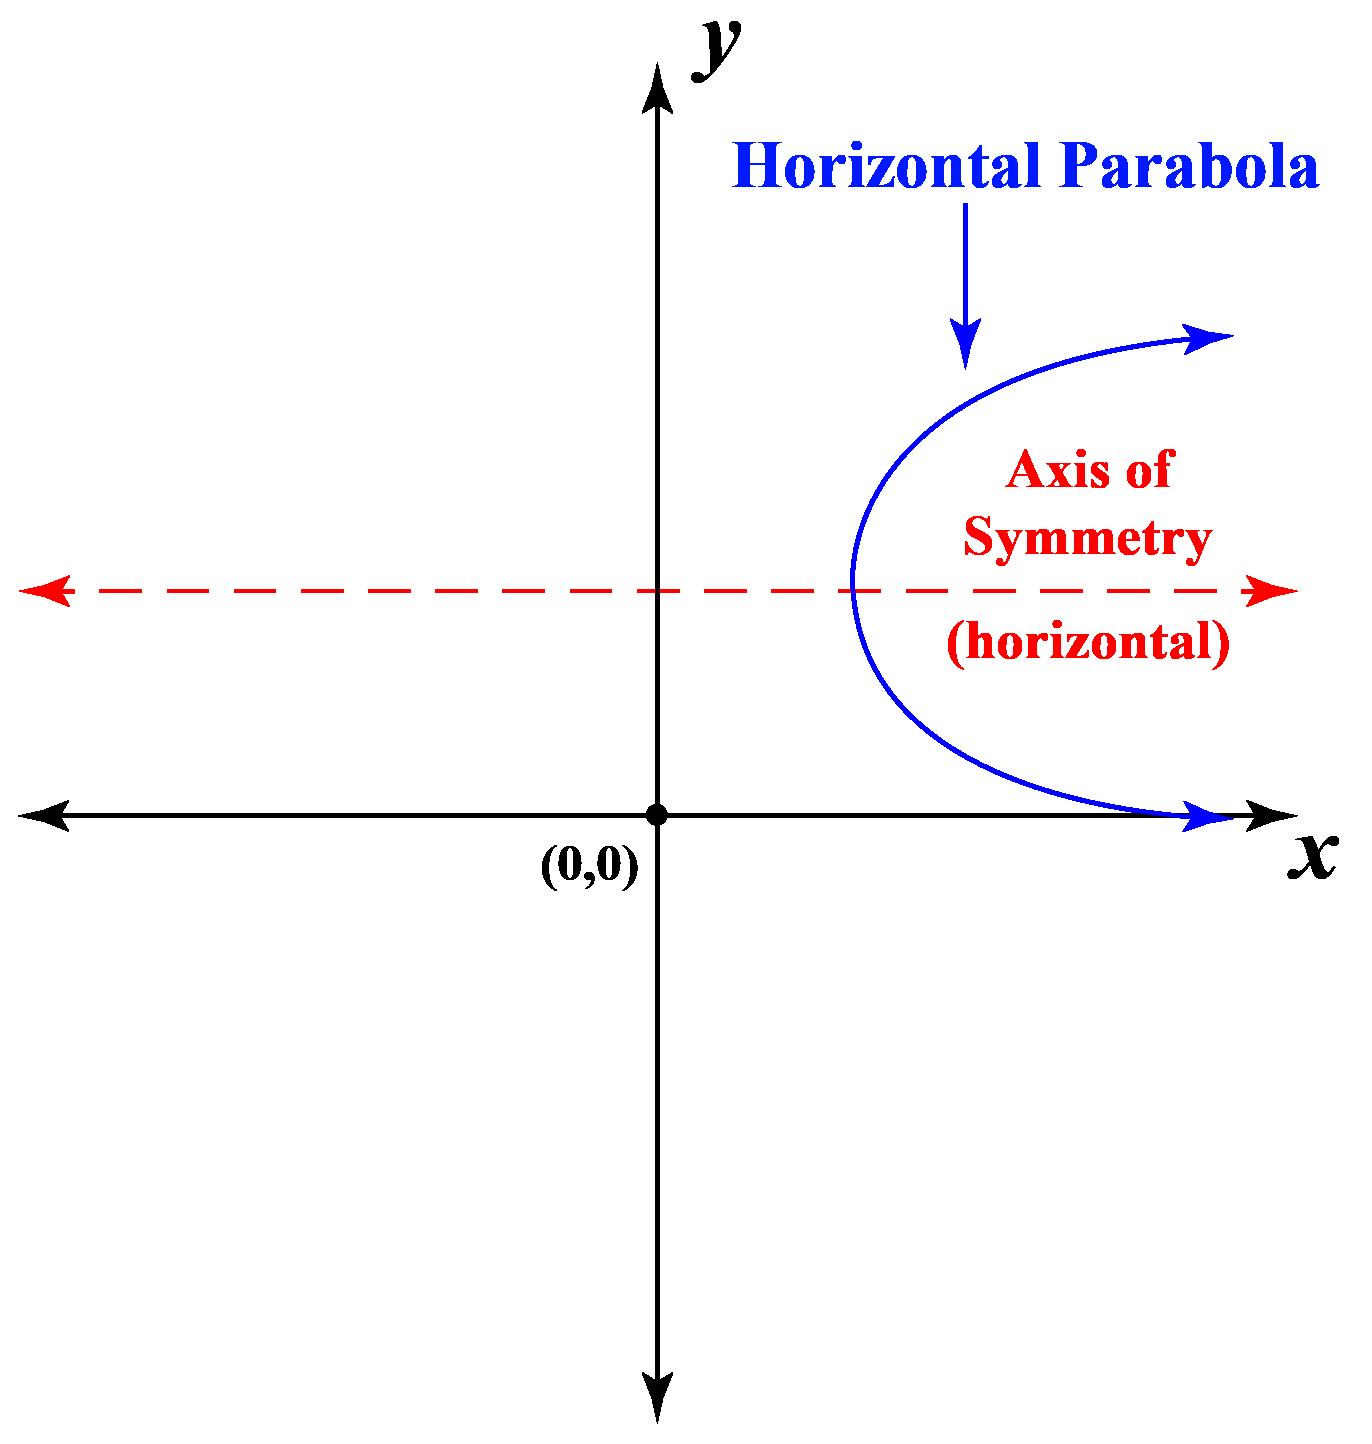 Axis of symmetry of a horizontal parabola